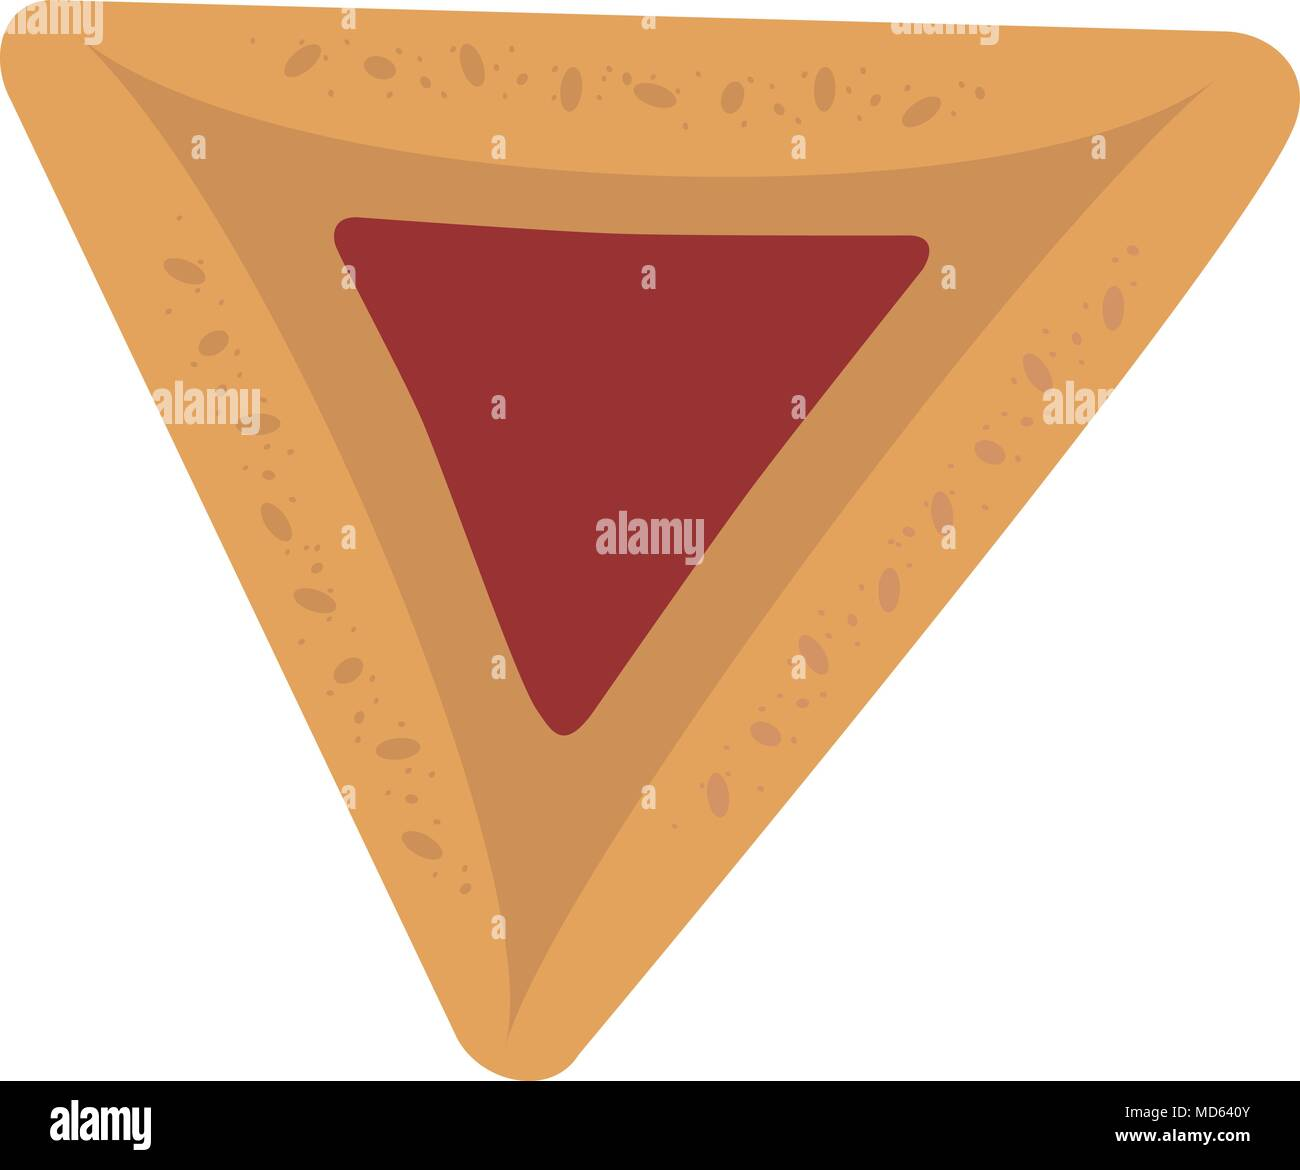 Purim holiday hamantash with strawberry jam flat design icon. Vector eps10 illustration. - Stock Image